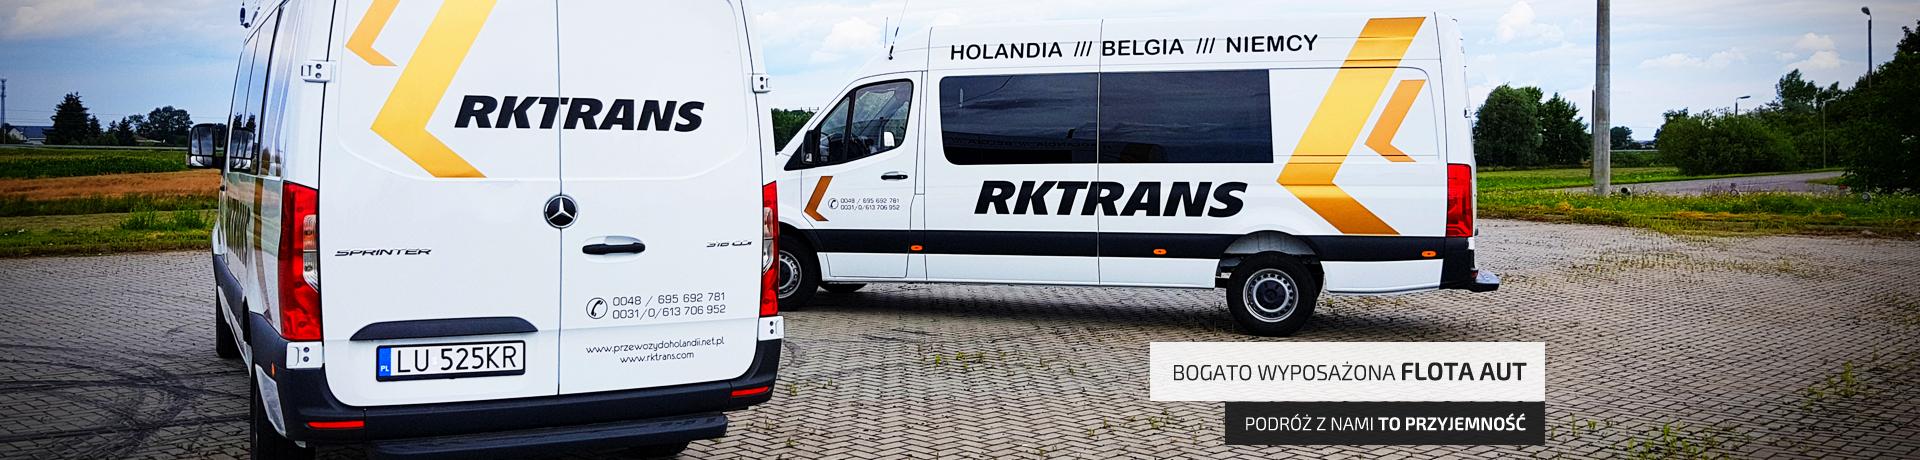 przewozy do holandii - bogato wyposażona flota aut